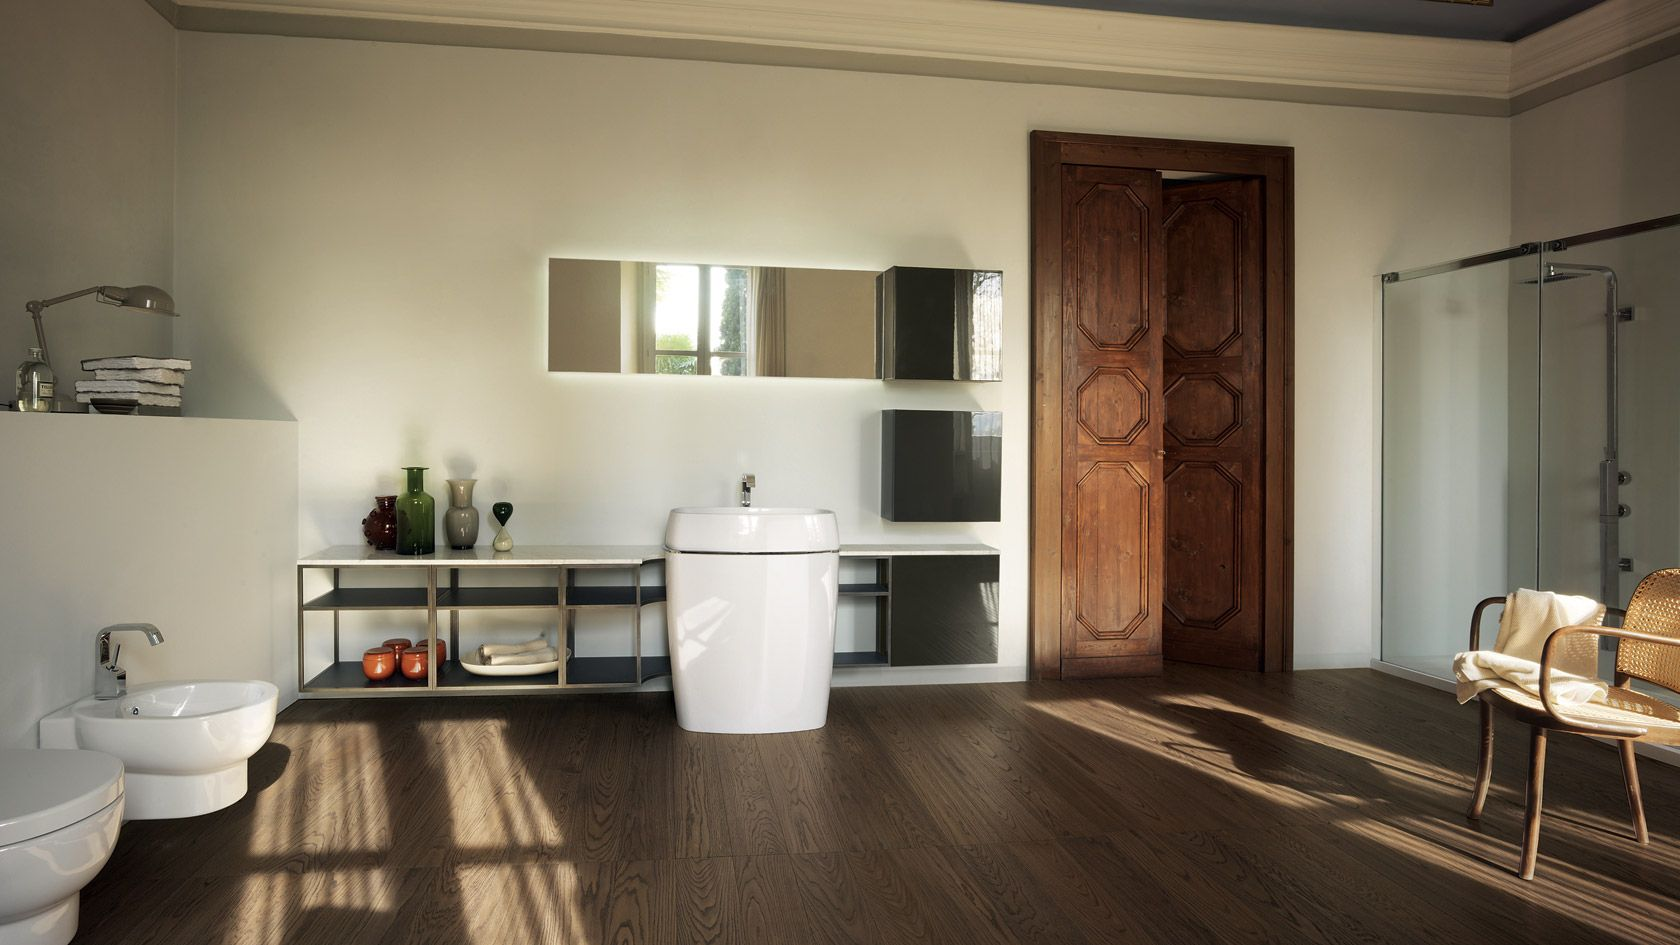 Scavolini Bagno ~ Bagno font scavolini bathroom fonts bath and washroom